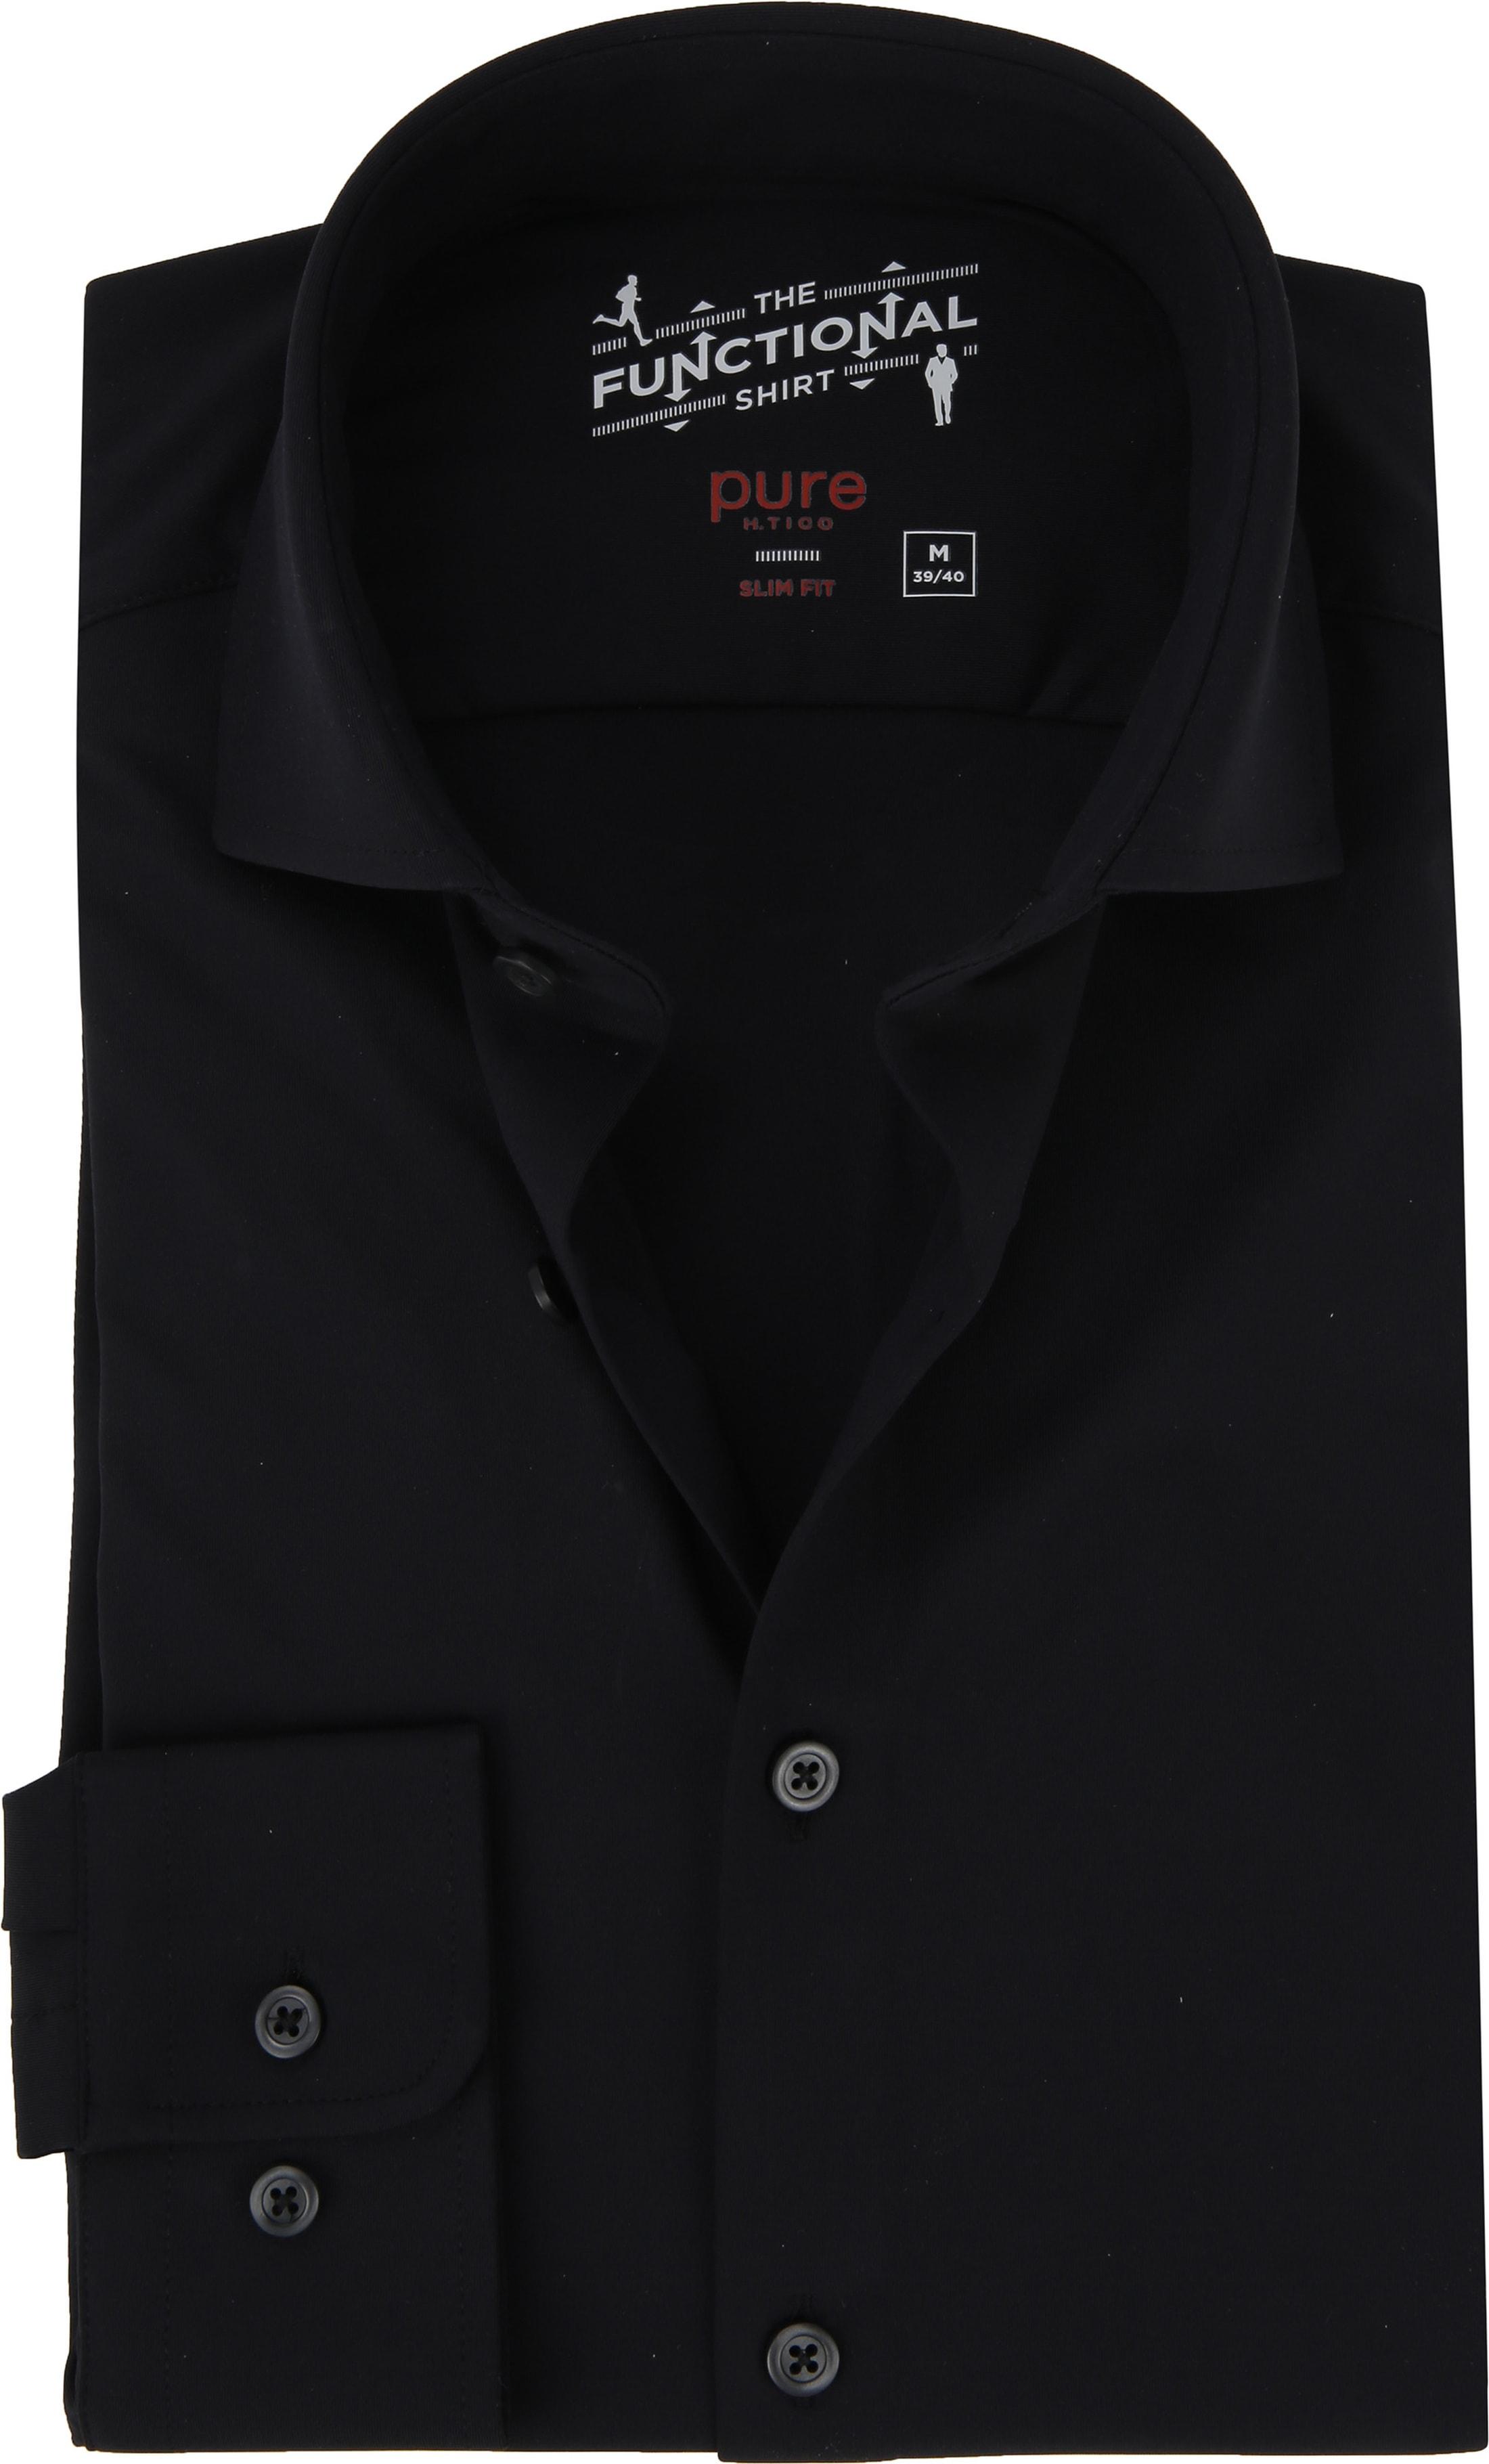 Pure The Functional Shirt Black foto 0